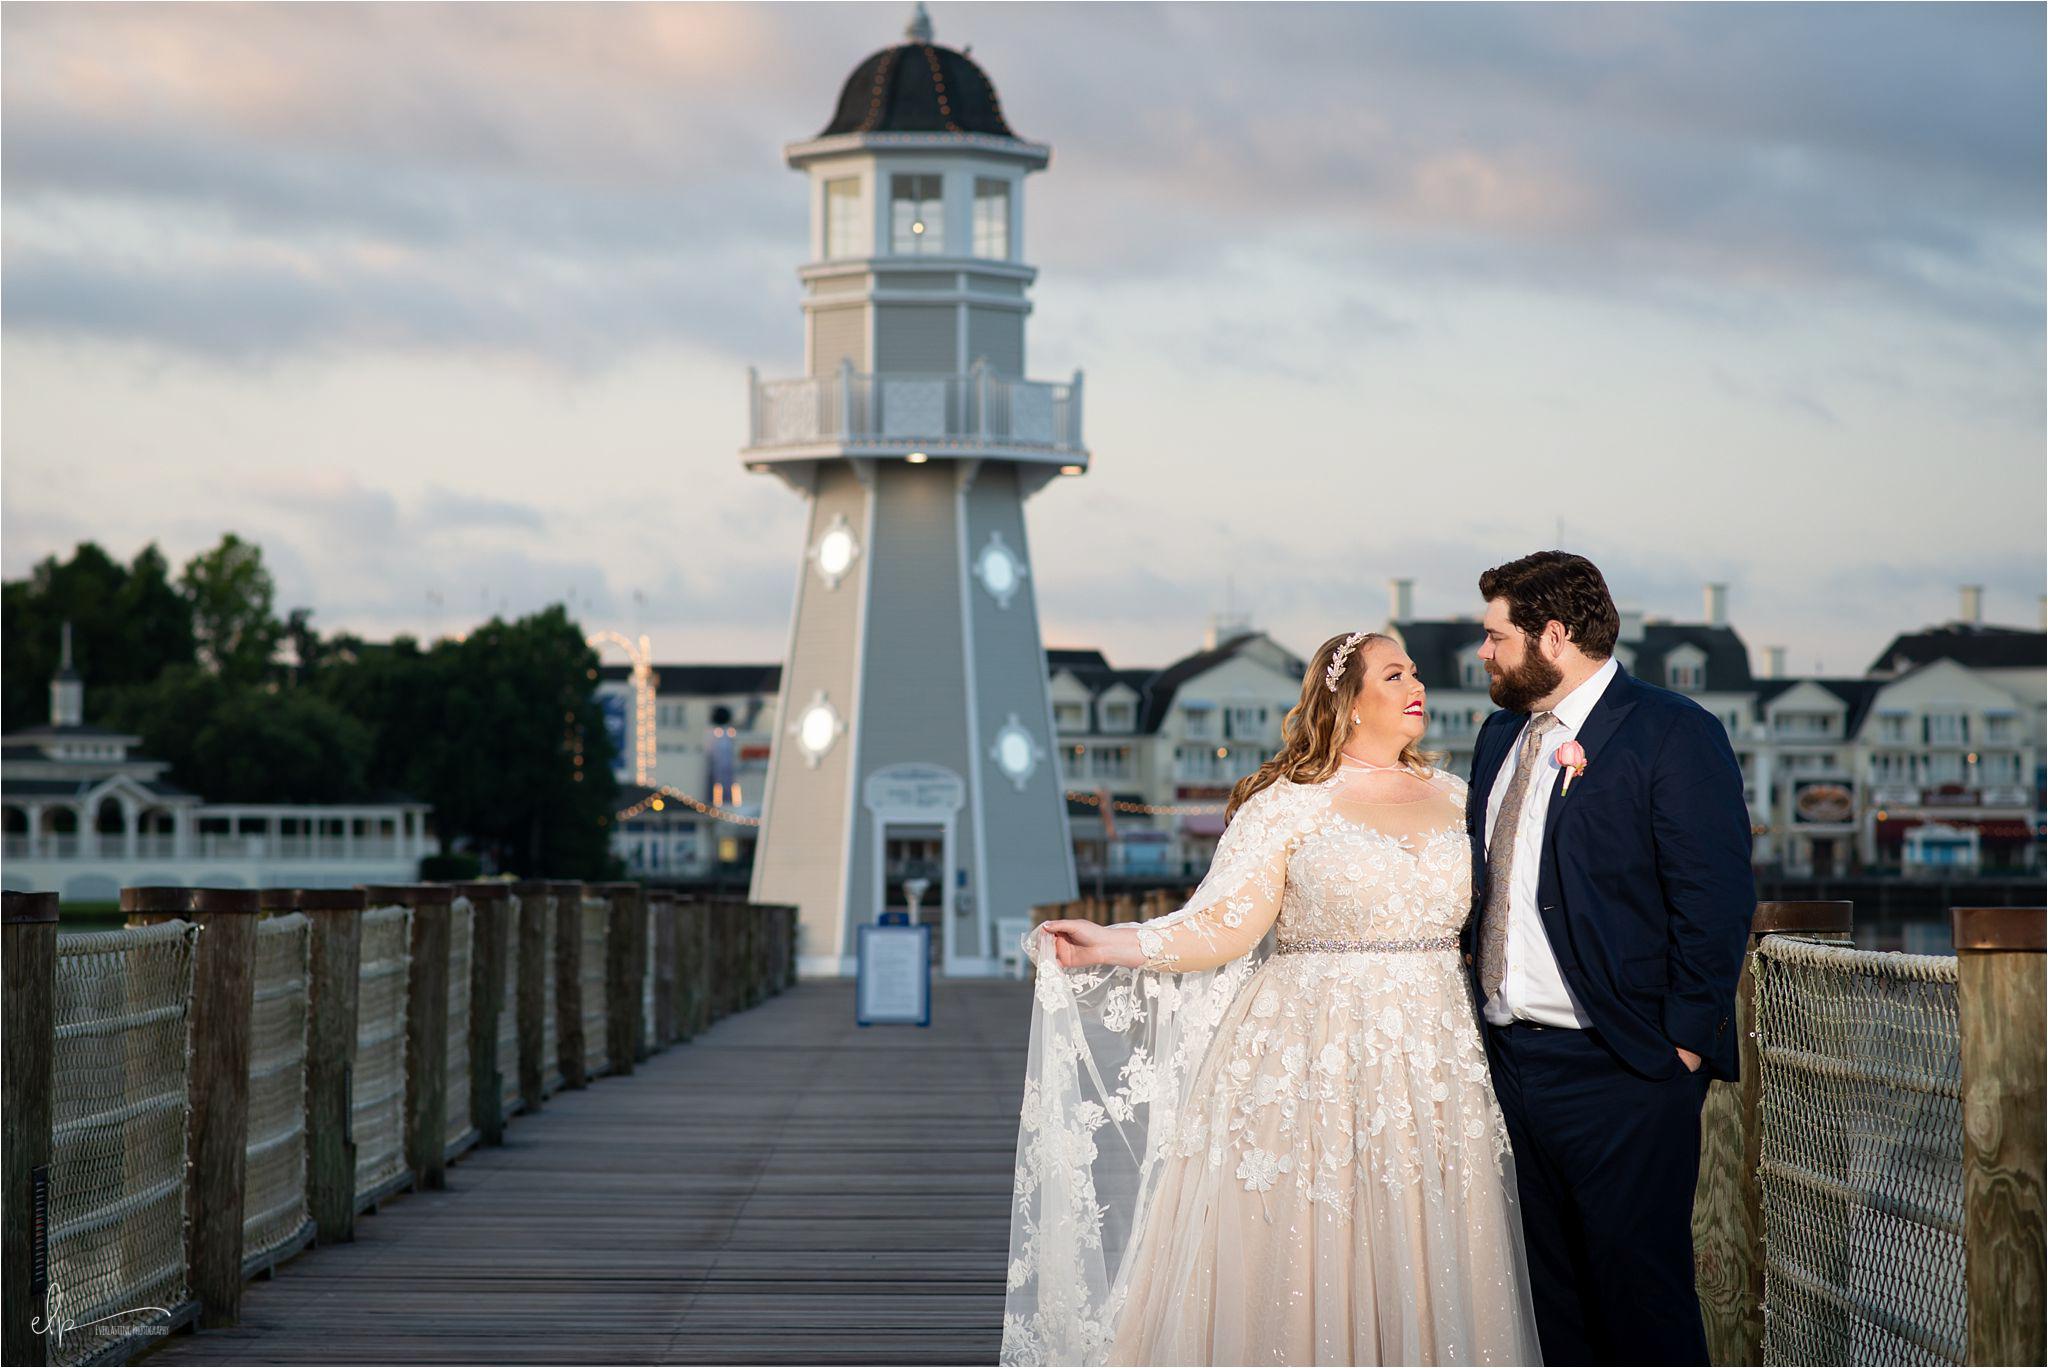 Wedding Photography at Walt Disney World